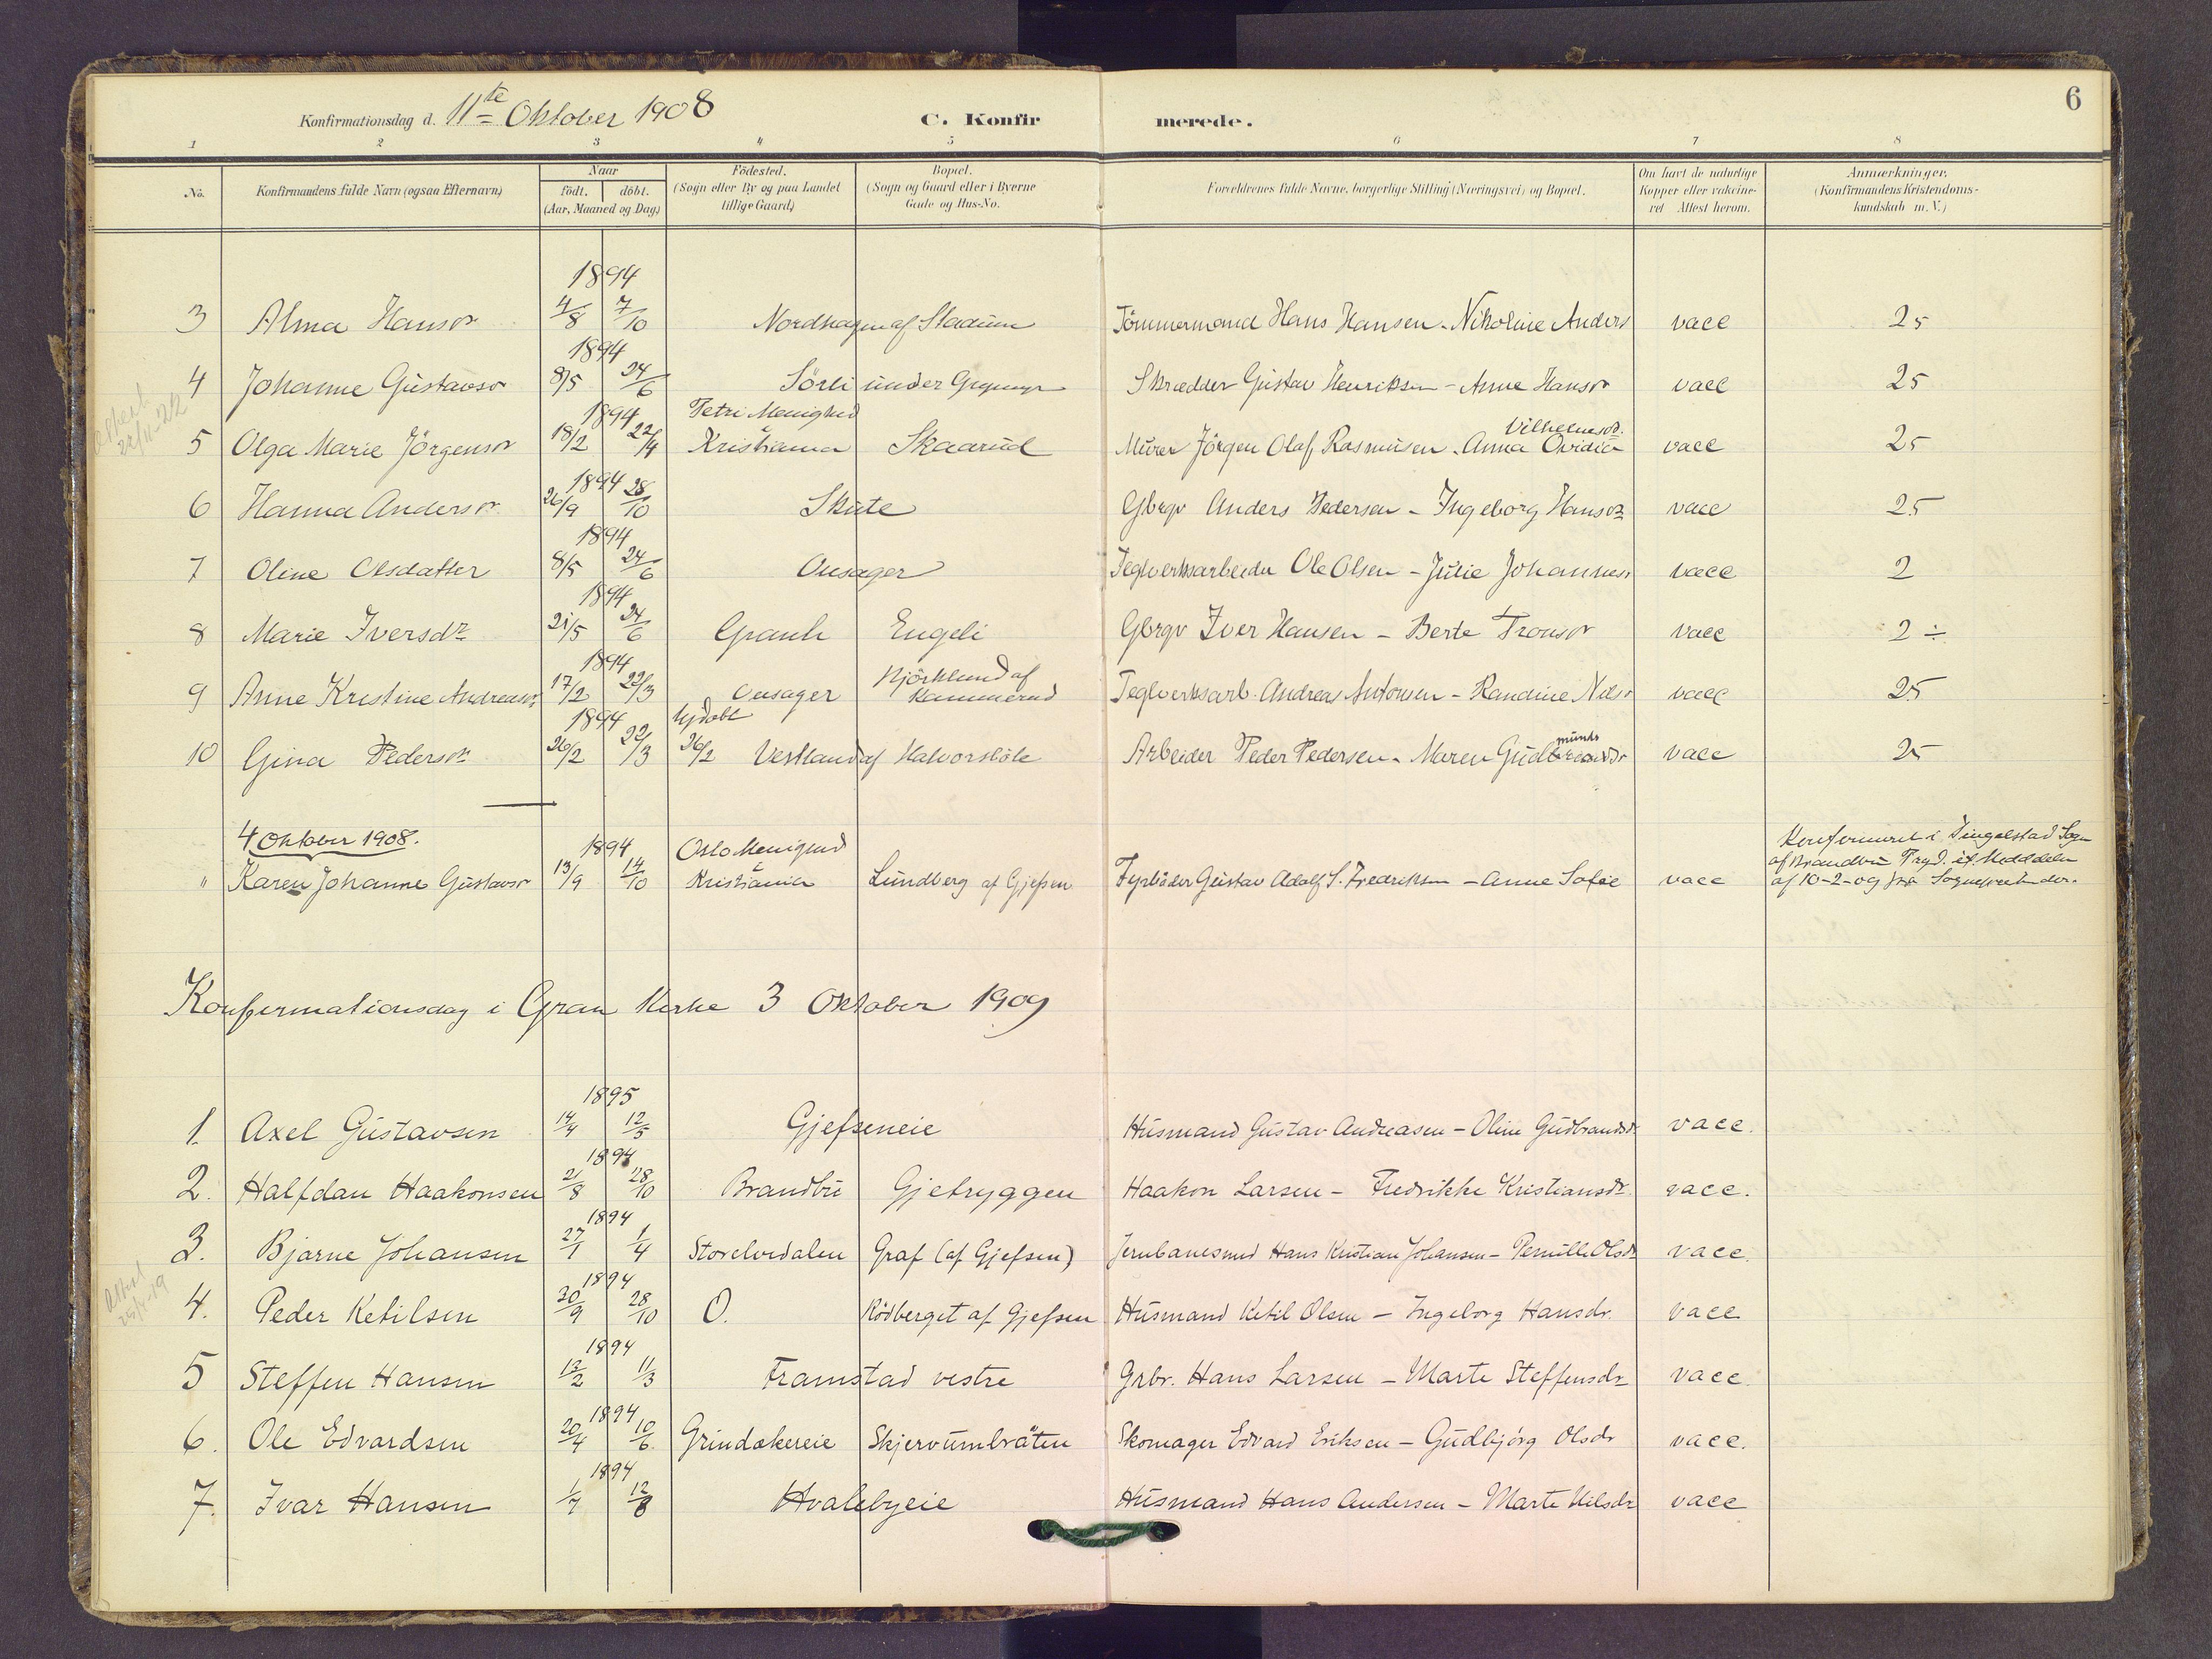 SAH, Gran prestekontor, Ministerialbok nr. 22, 1908-1918, s. 6